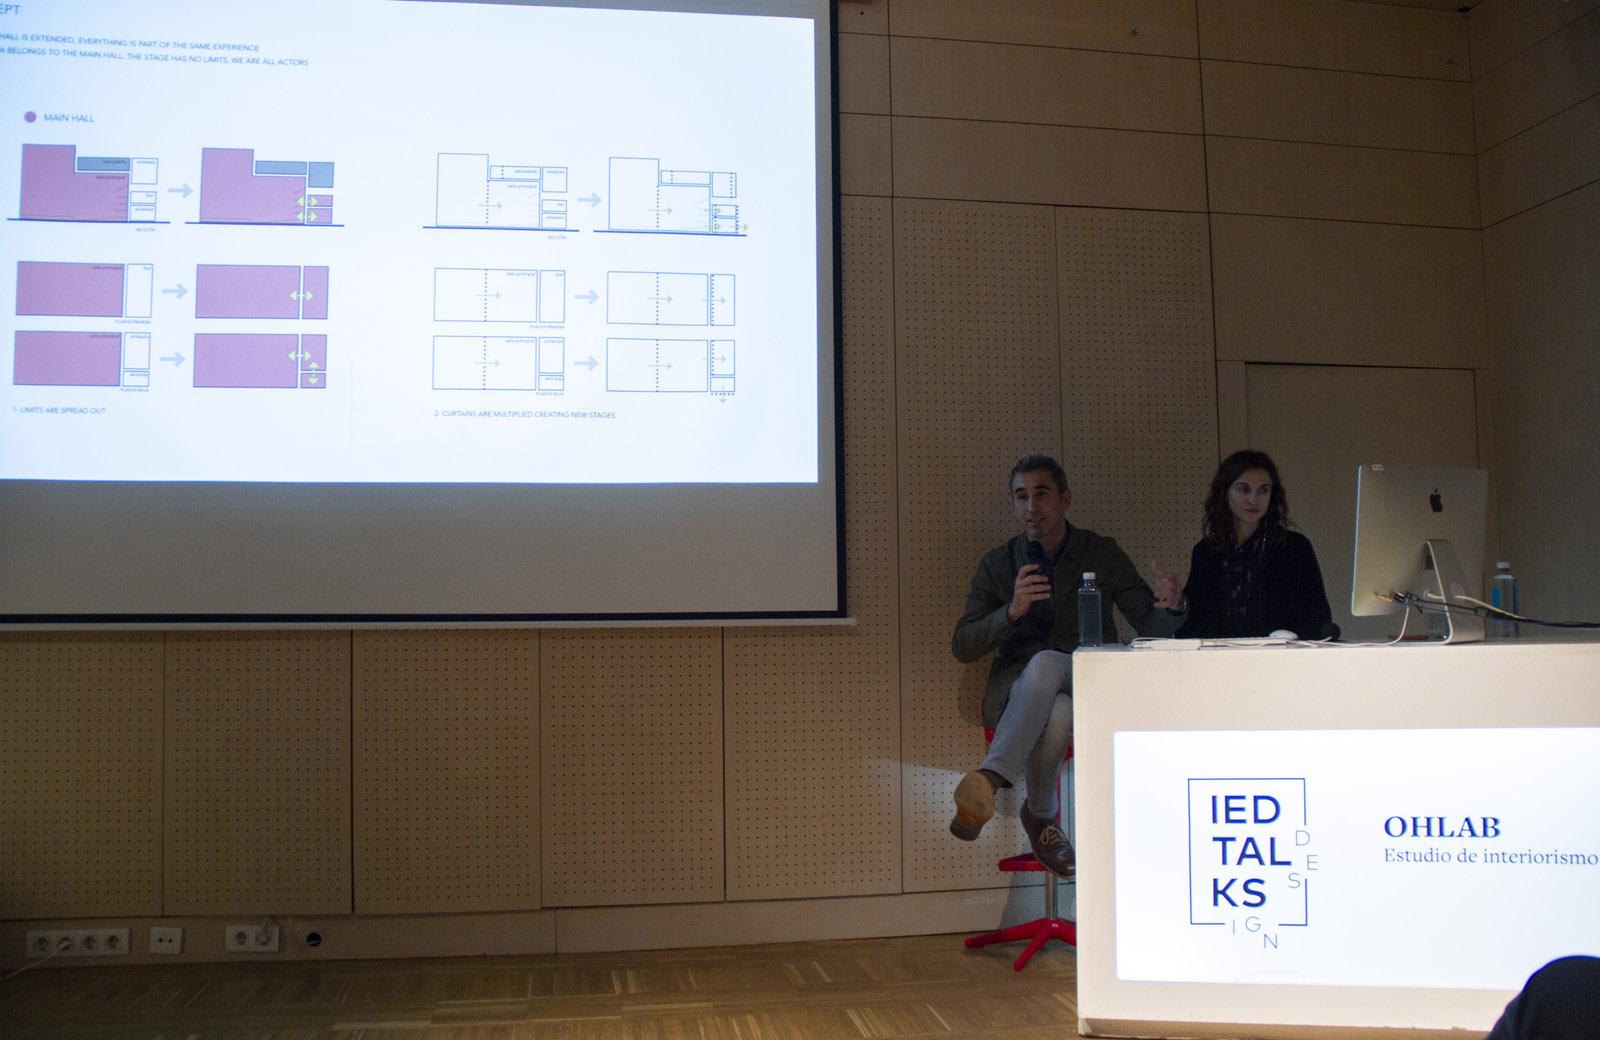 ied-talks_conferencia_03